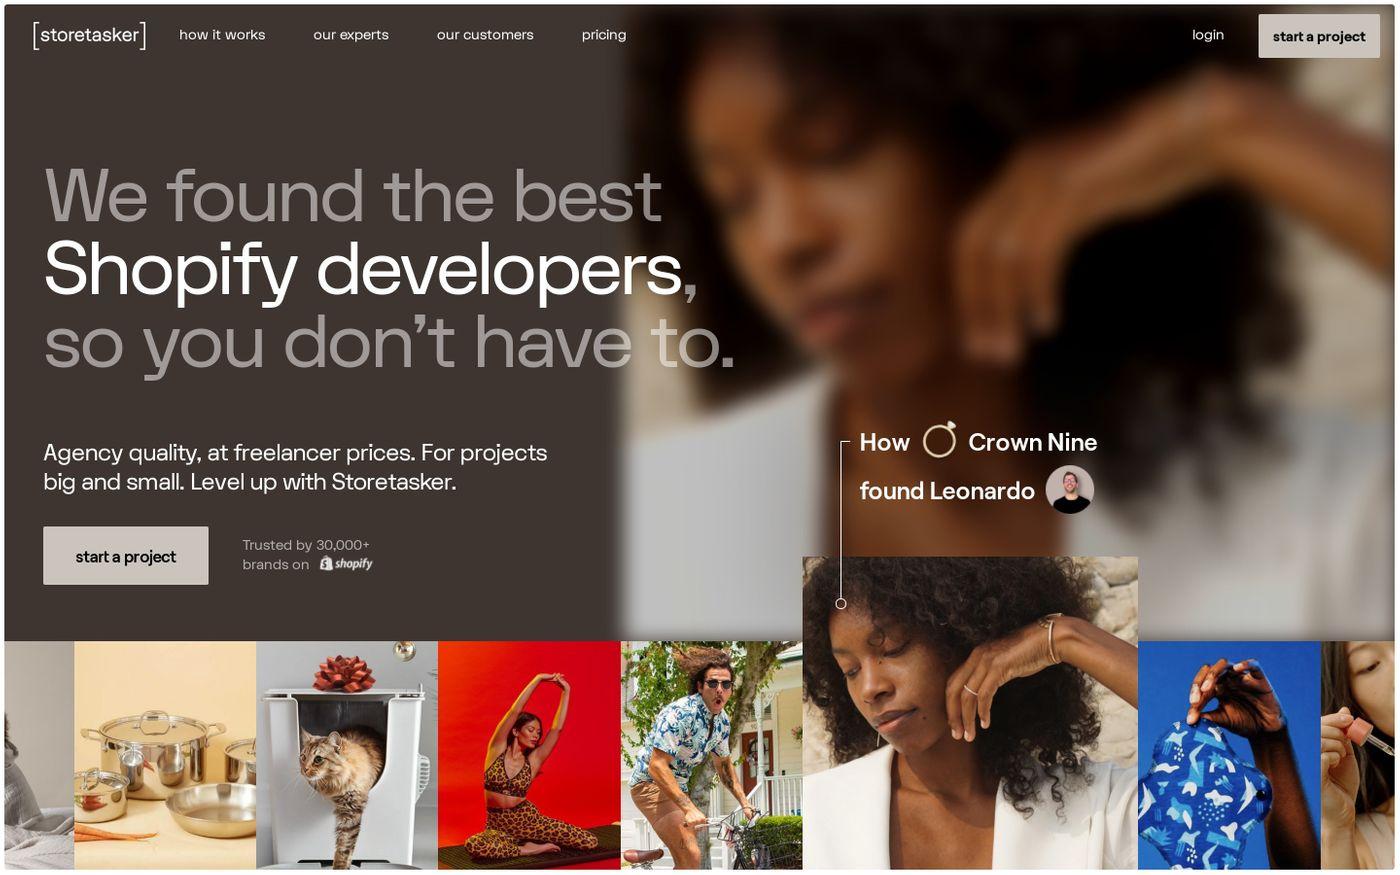 Screenshot of Storetasker website